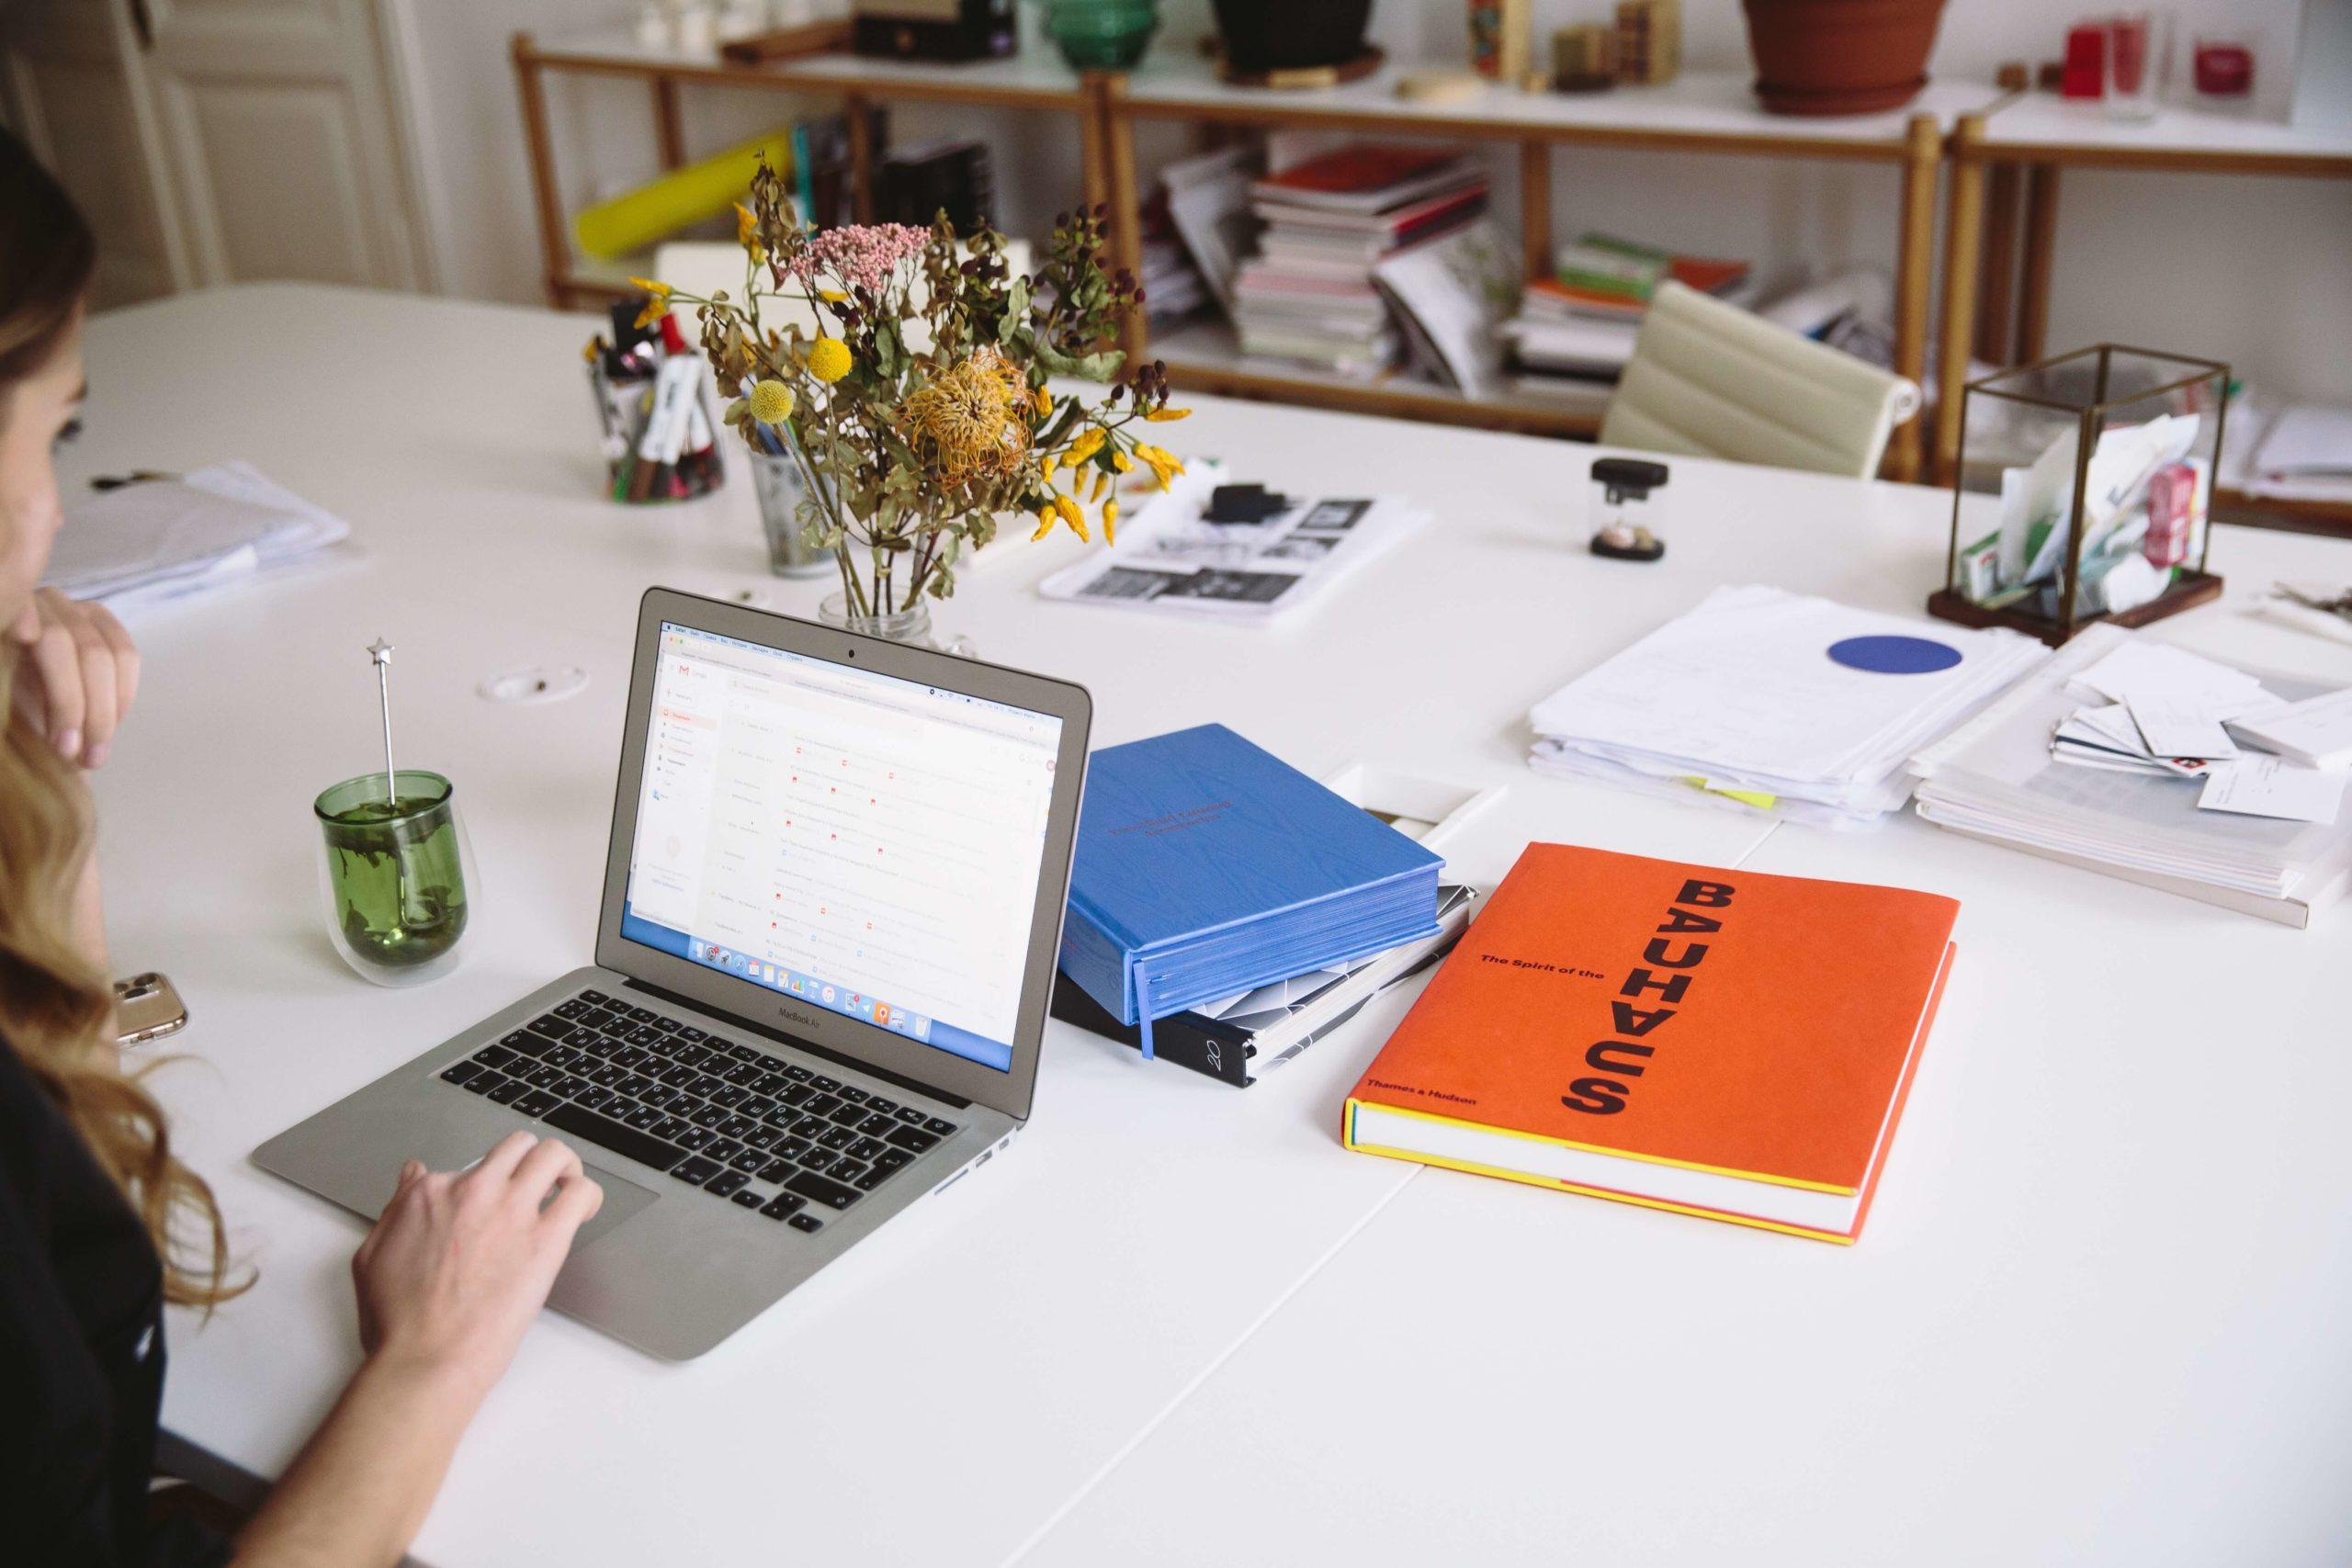 photo of orange book beside laptop 3747455 1 scaled